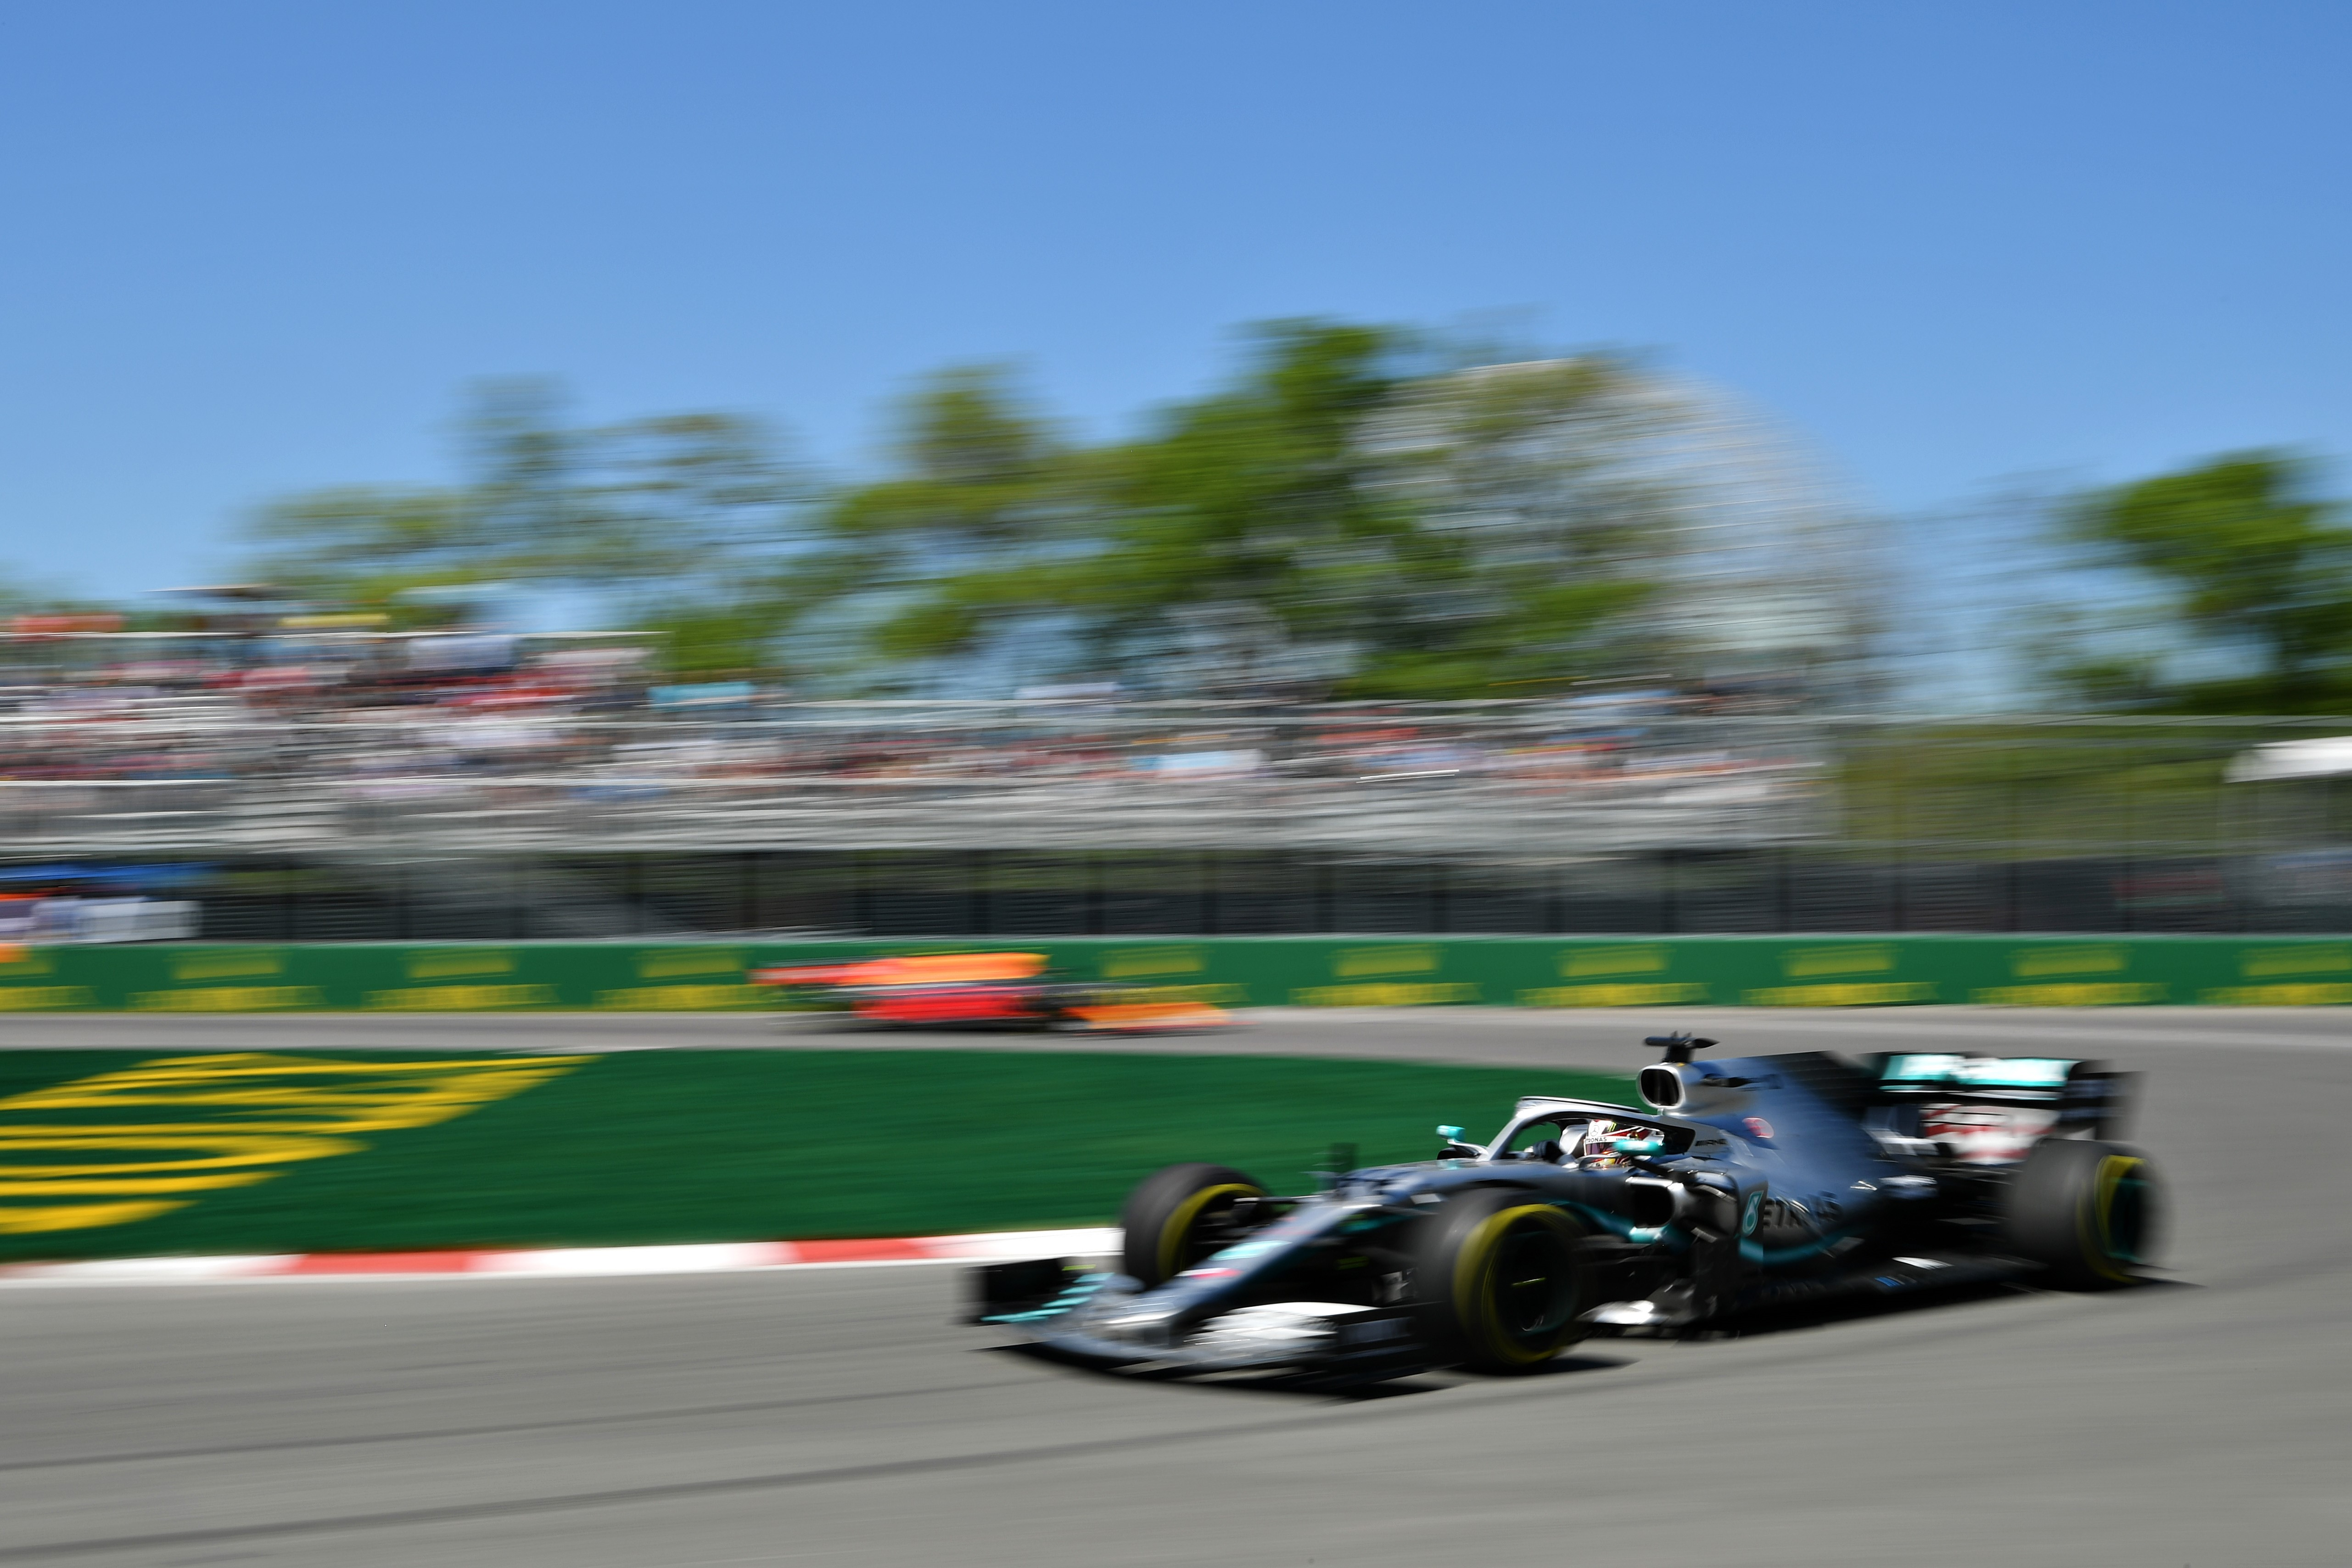 Lewis Hamilton (Mercedes) au Grand Prix du Canada 2019